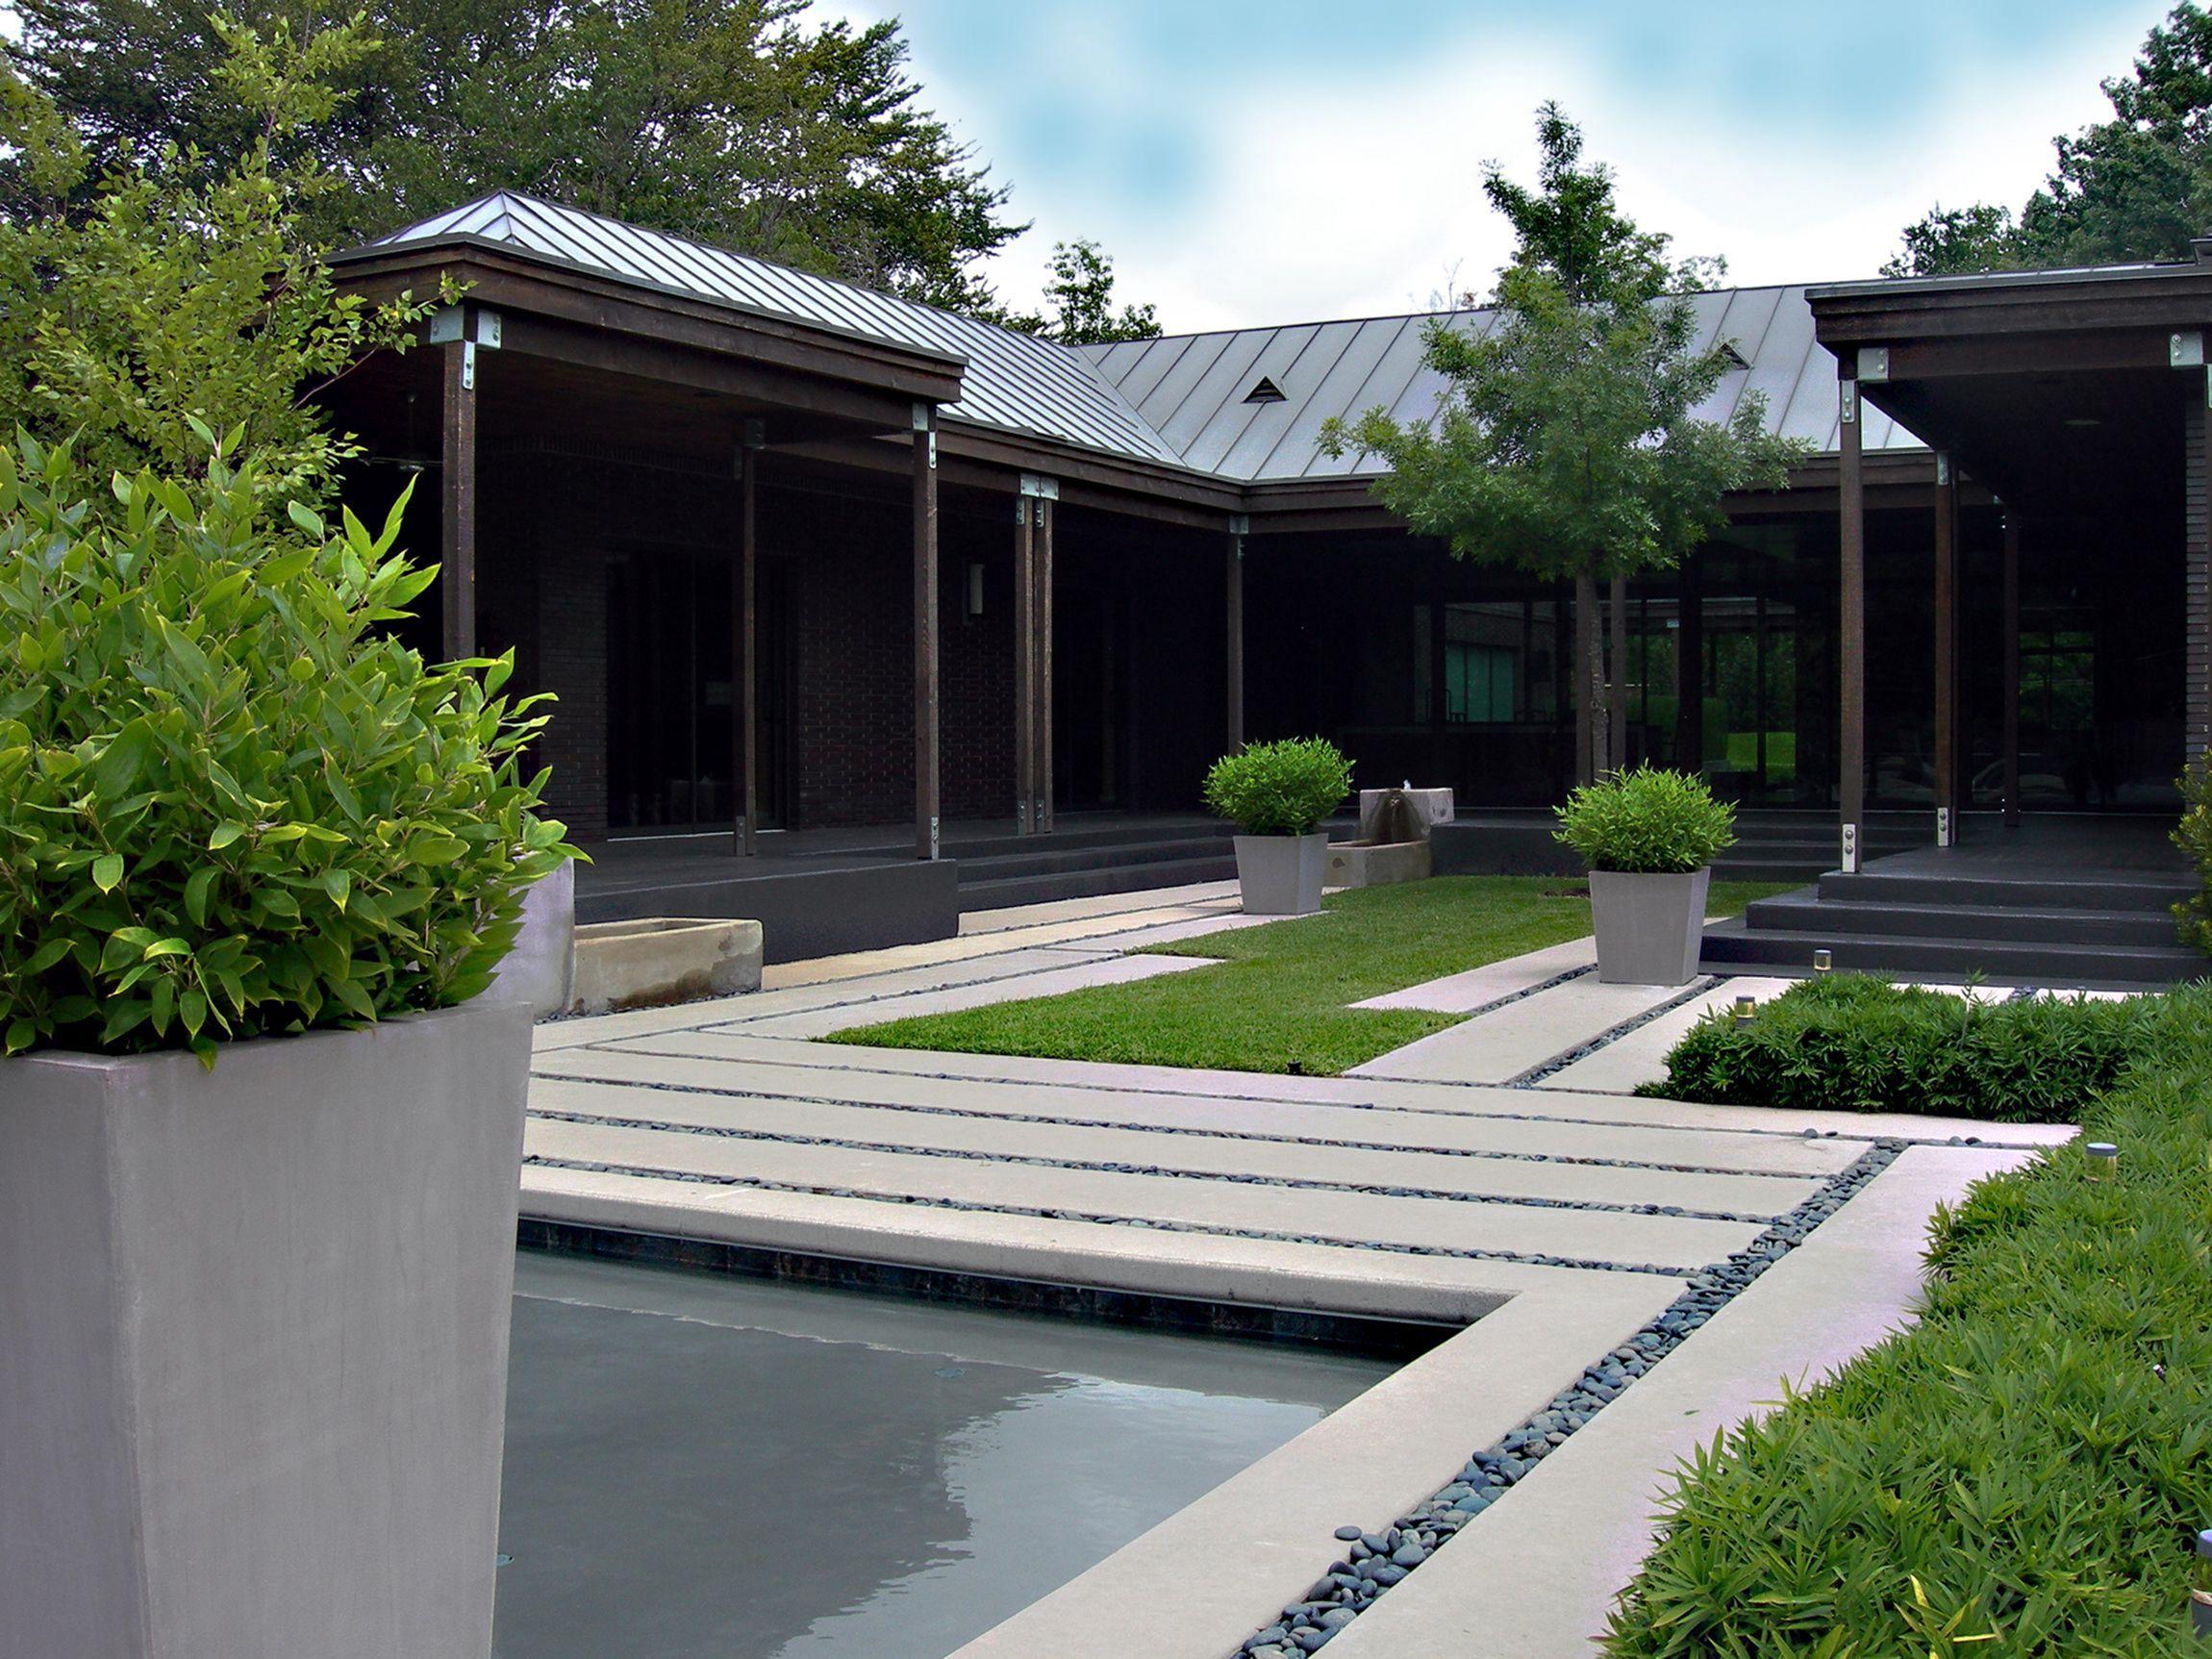 30 Fantastic Modern Backyard Landscaping Designs For Your Home Modern Backyard Landscaping Modern Landscaping Backyard Landscaping Designs